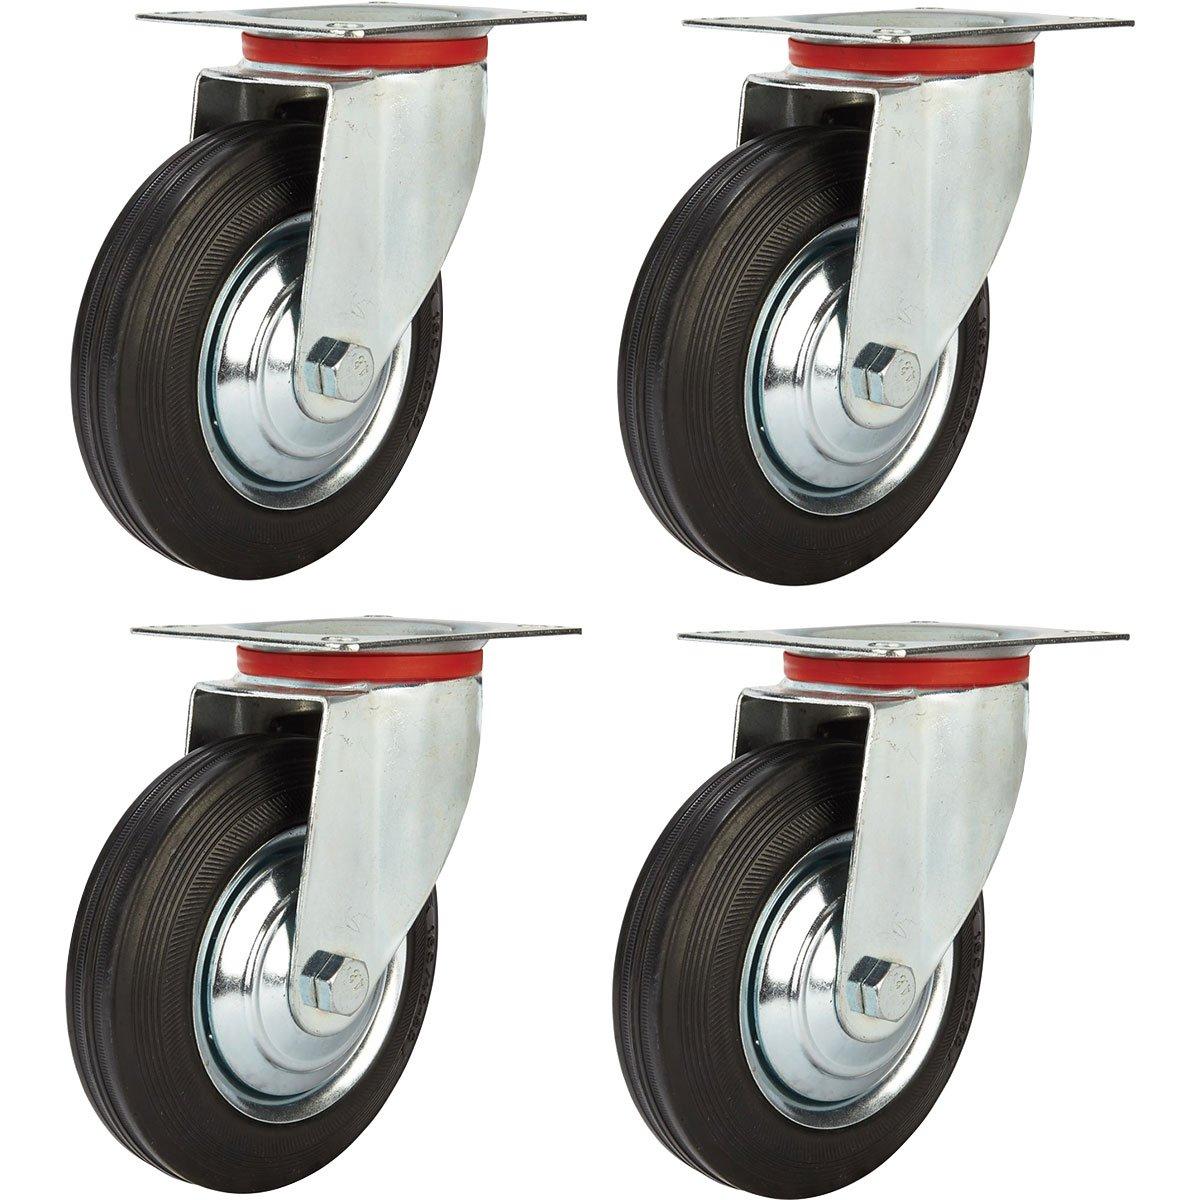 Online Best Service 4 Pack 5'' Swivel Caster Wheels Rubber Base with Top Plate & Bearing Heavy Duty by Online Best Service